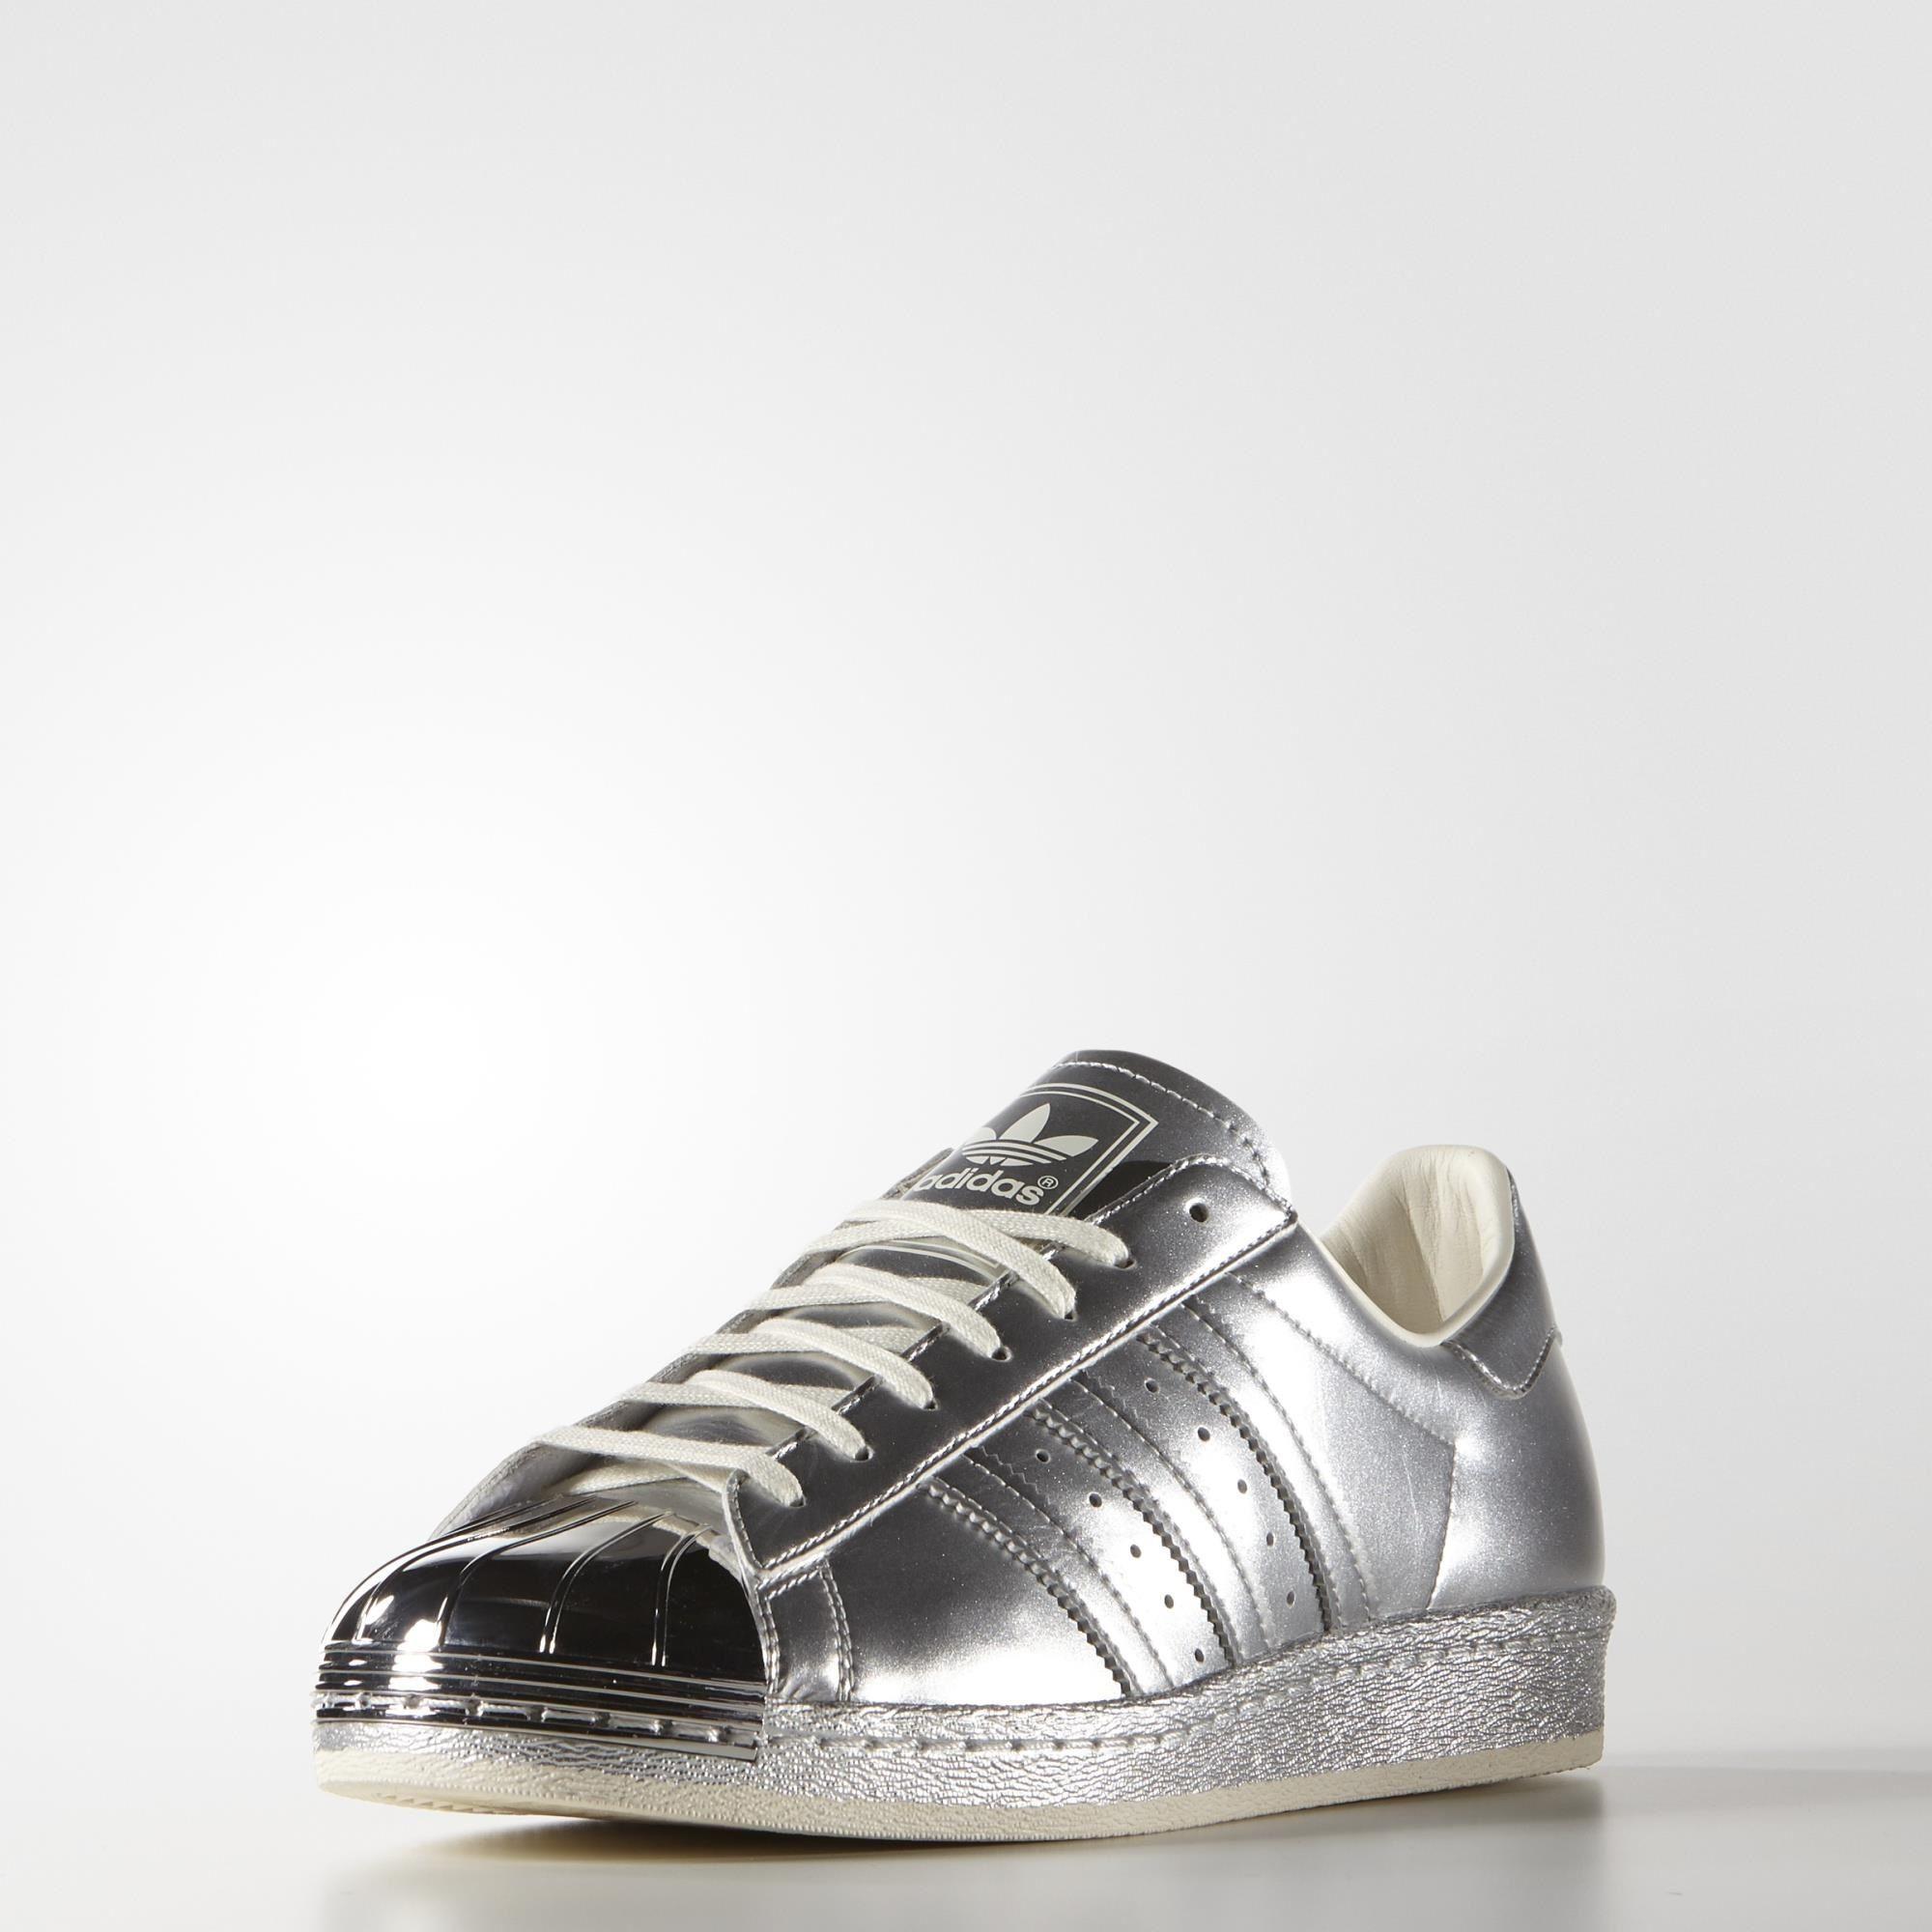 shoes, silver, metallic, fashion, style, trendy, adidas